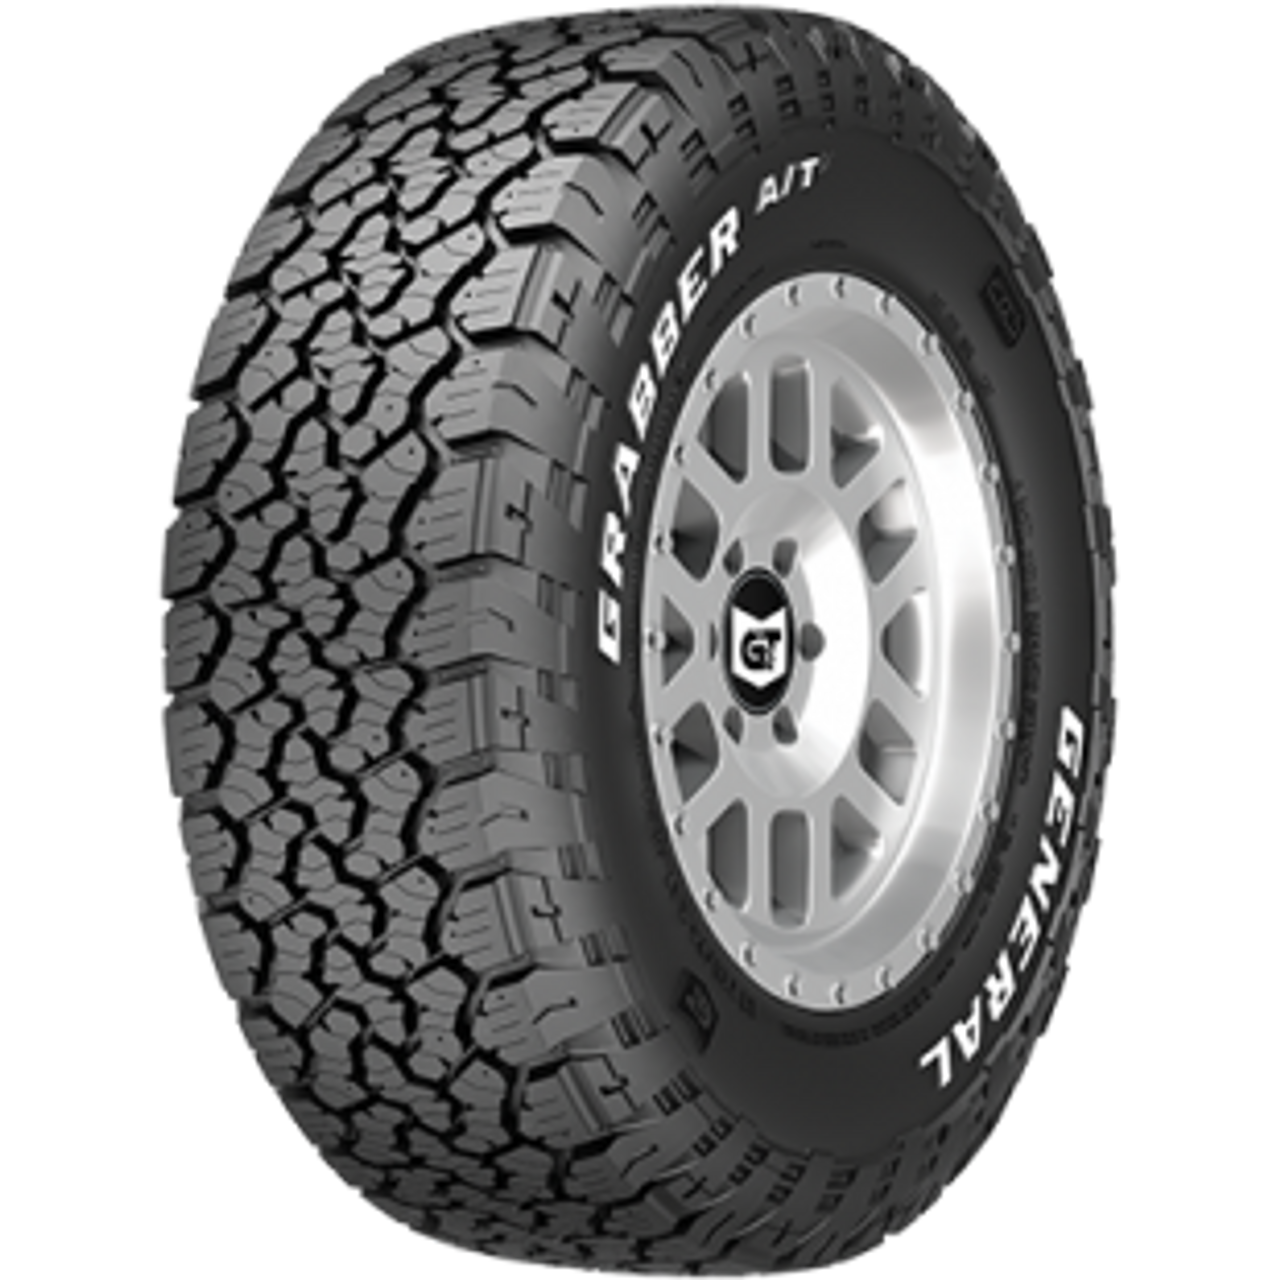 New Tire 235 75 15 General Grabber ATX RWL 6ply LT235/75R16 104S 50,000mile All Terrain